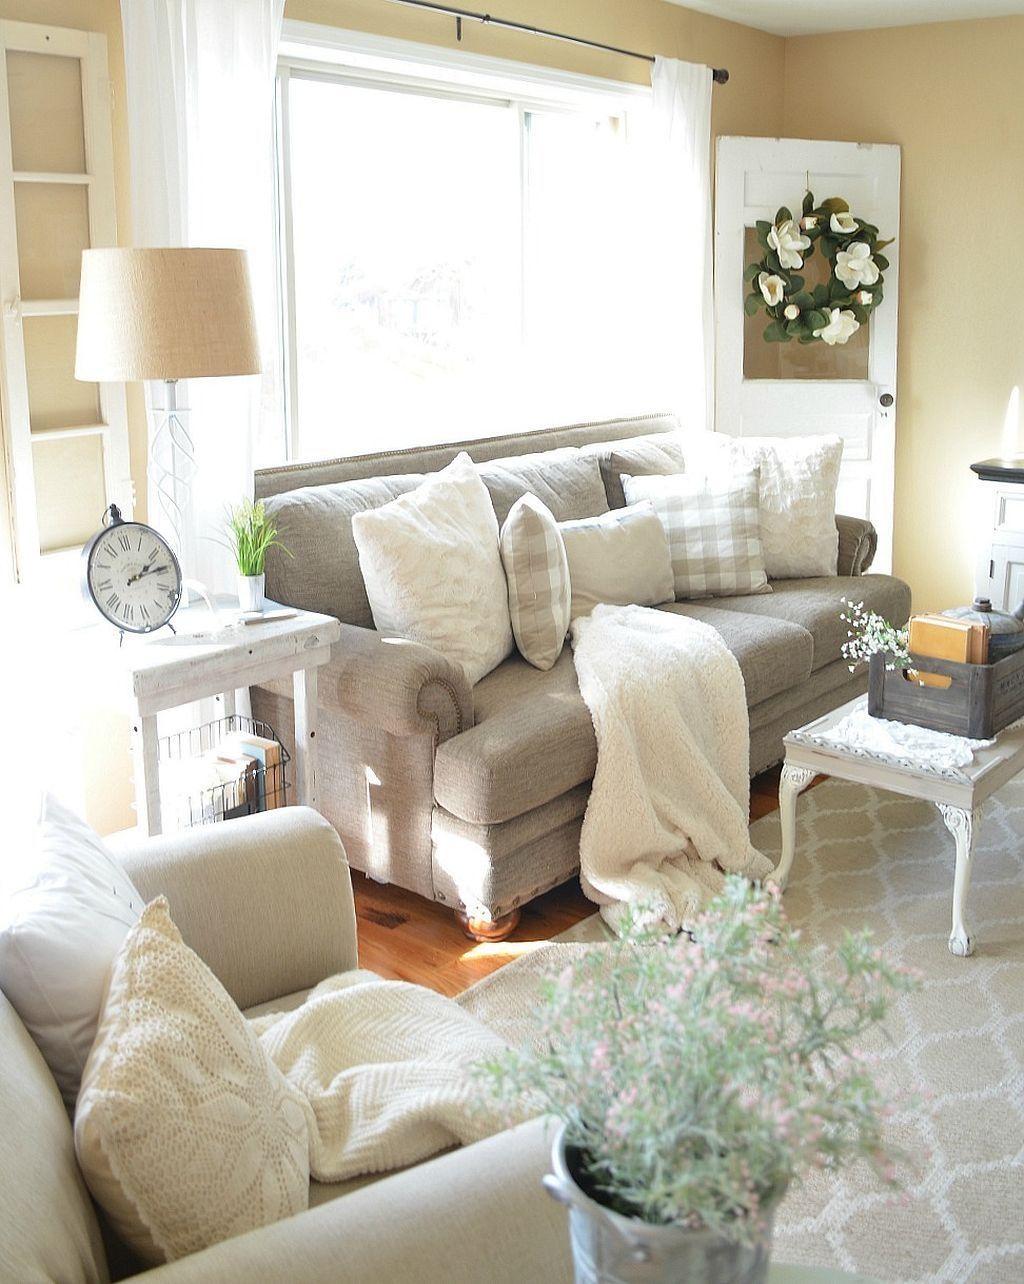 53 Stunning Farmhouse Living Room Decorating Ideas | Farmhouse ...